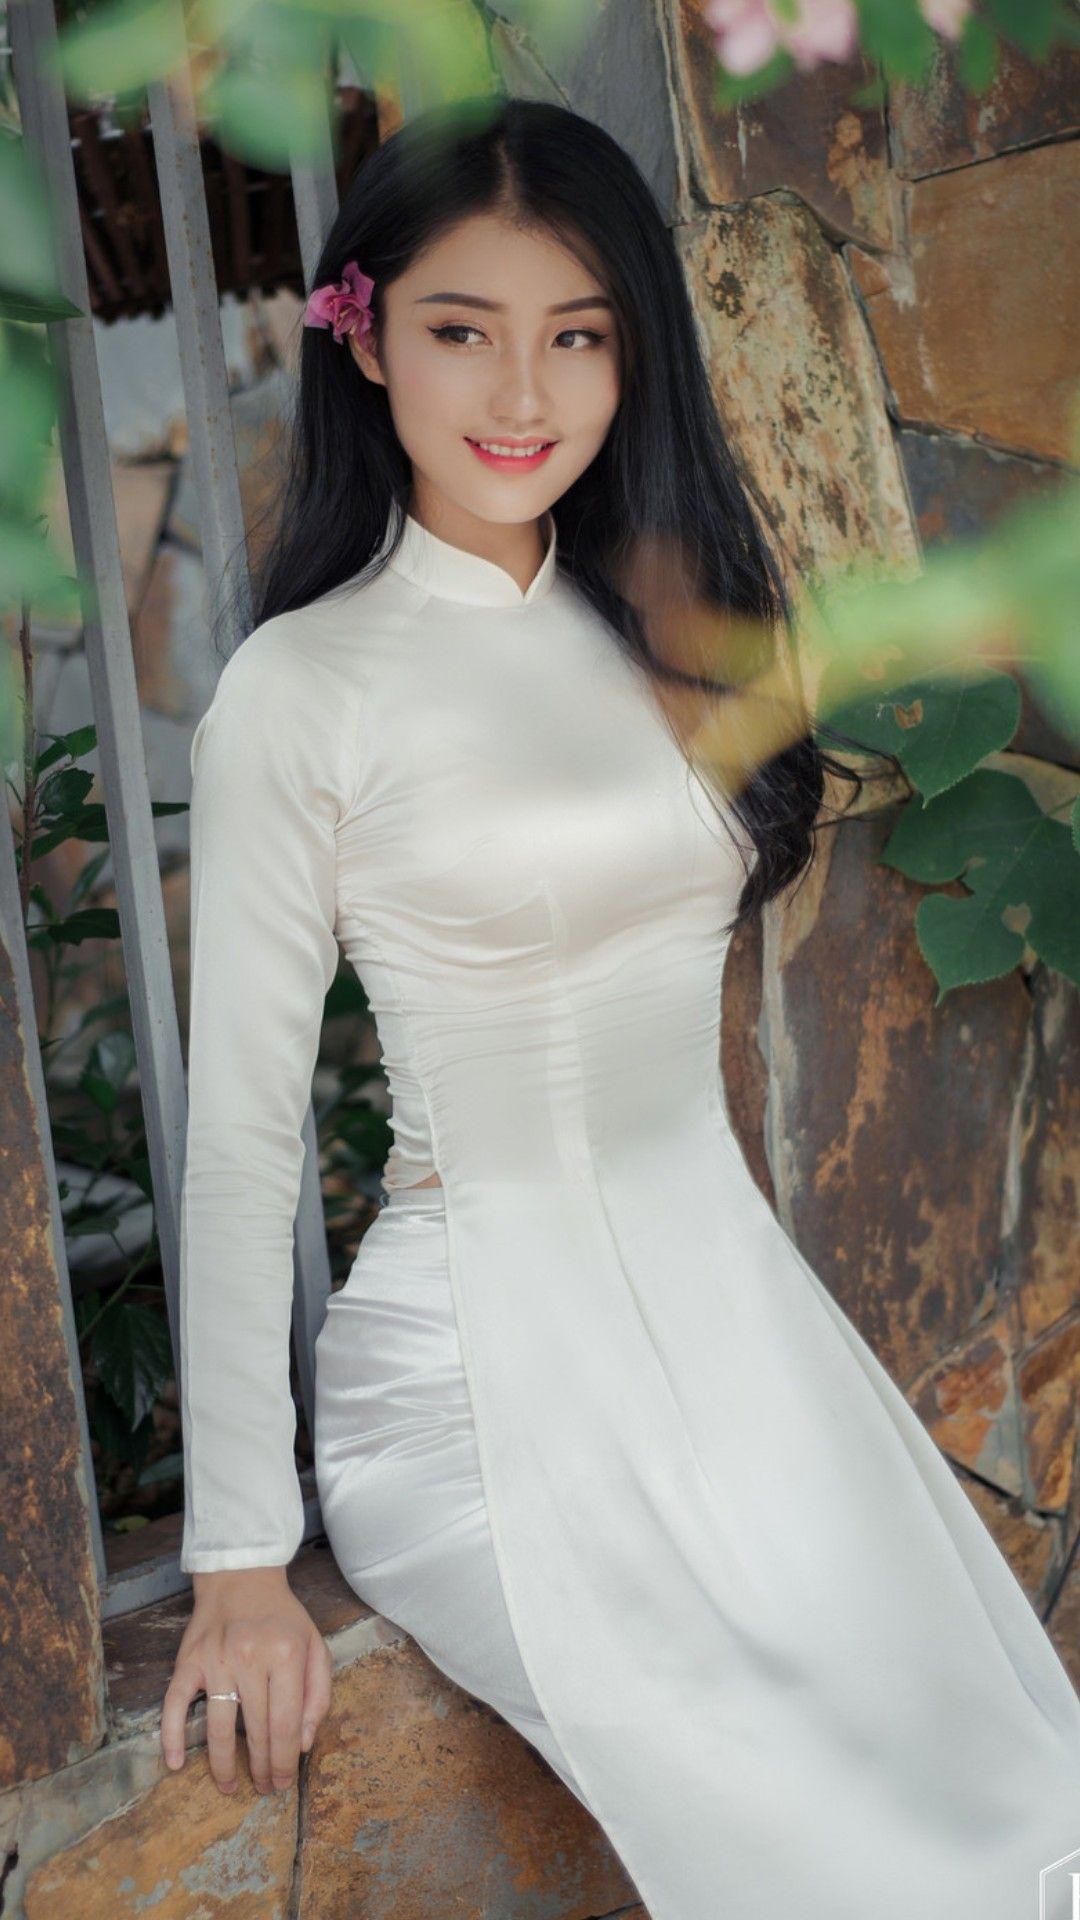 Vietnamese Teen Sexy - Skinny Nude Women